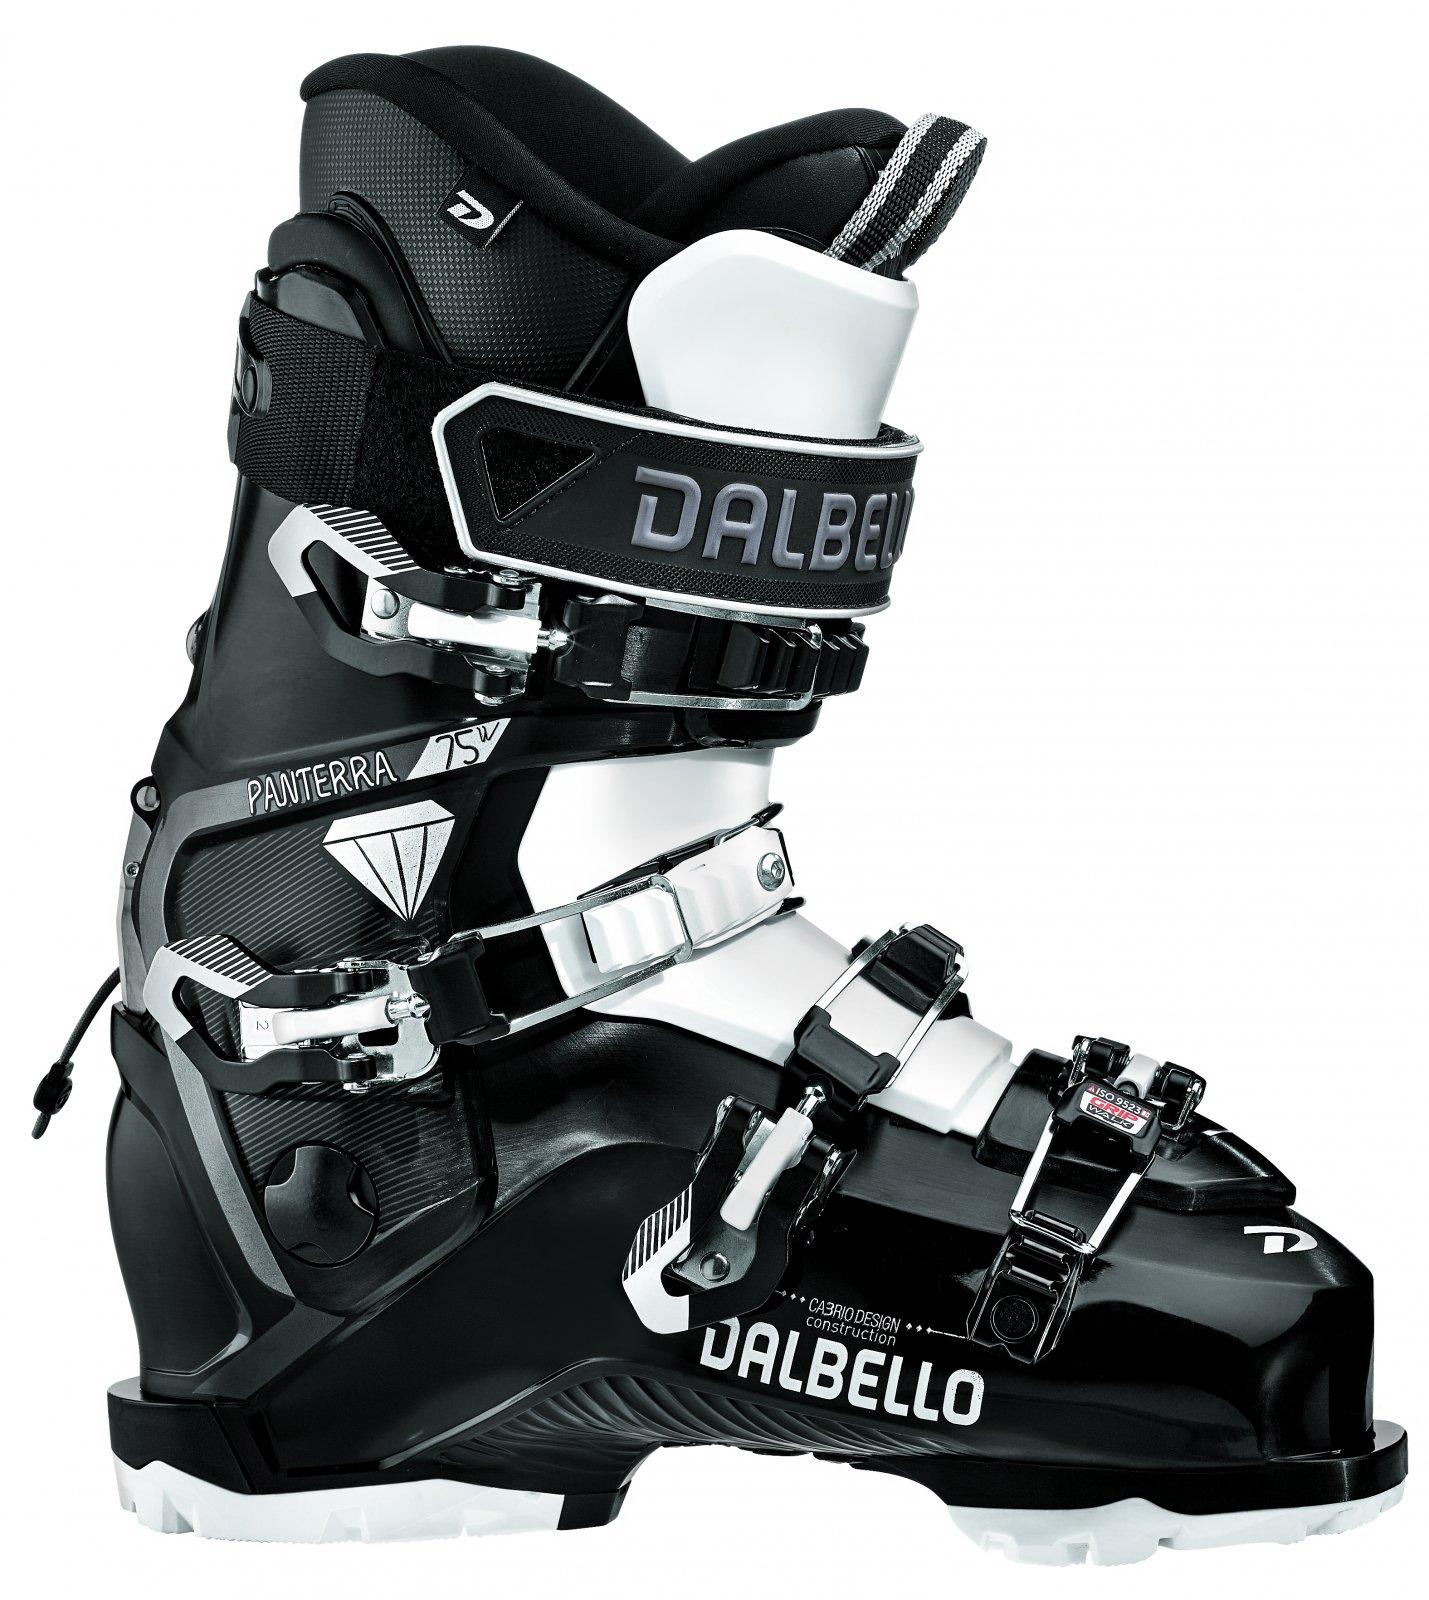 Dalbello Panterra 75 W GW Ski Boots 2020 - size 24.5